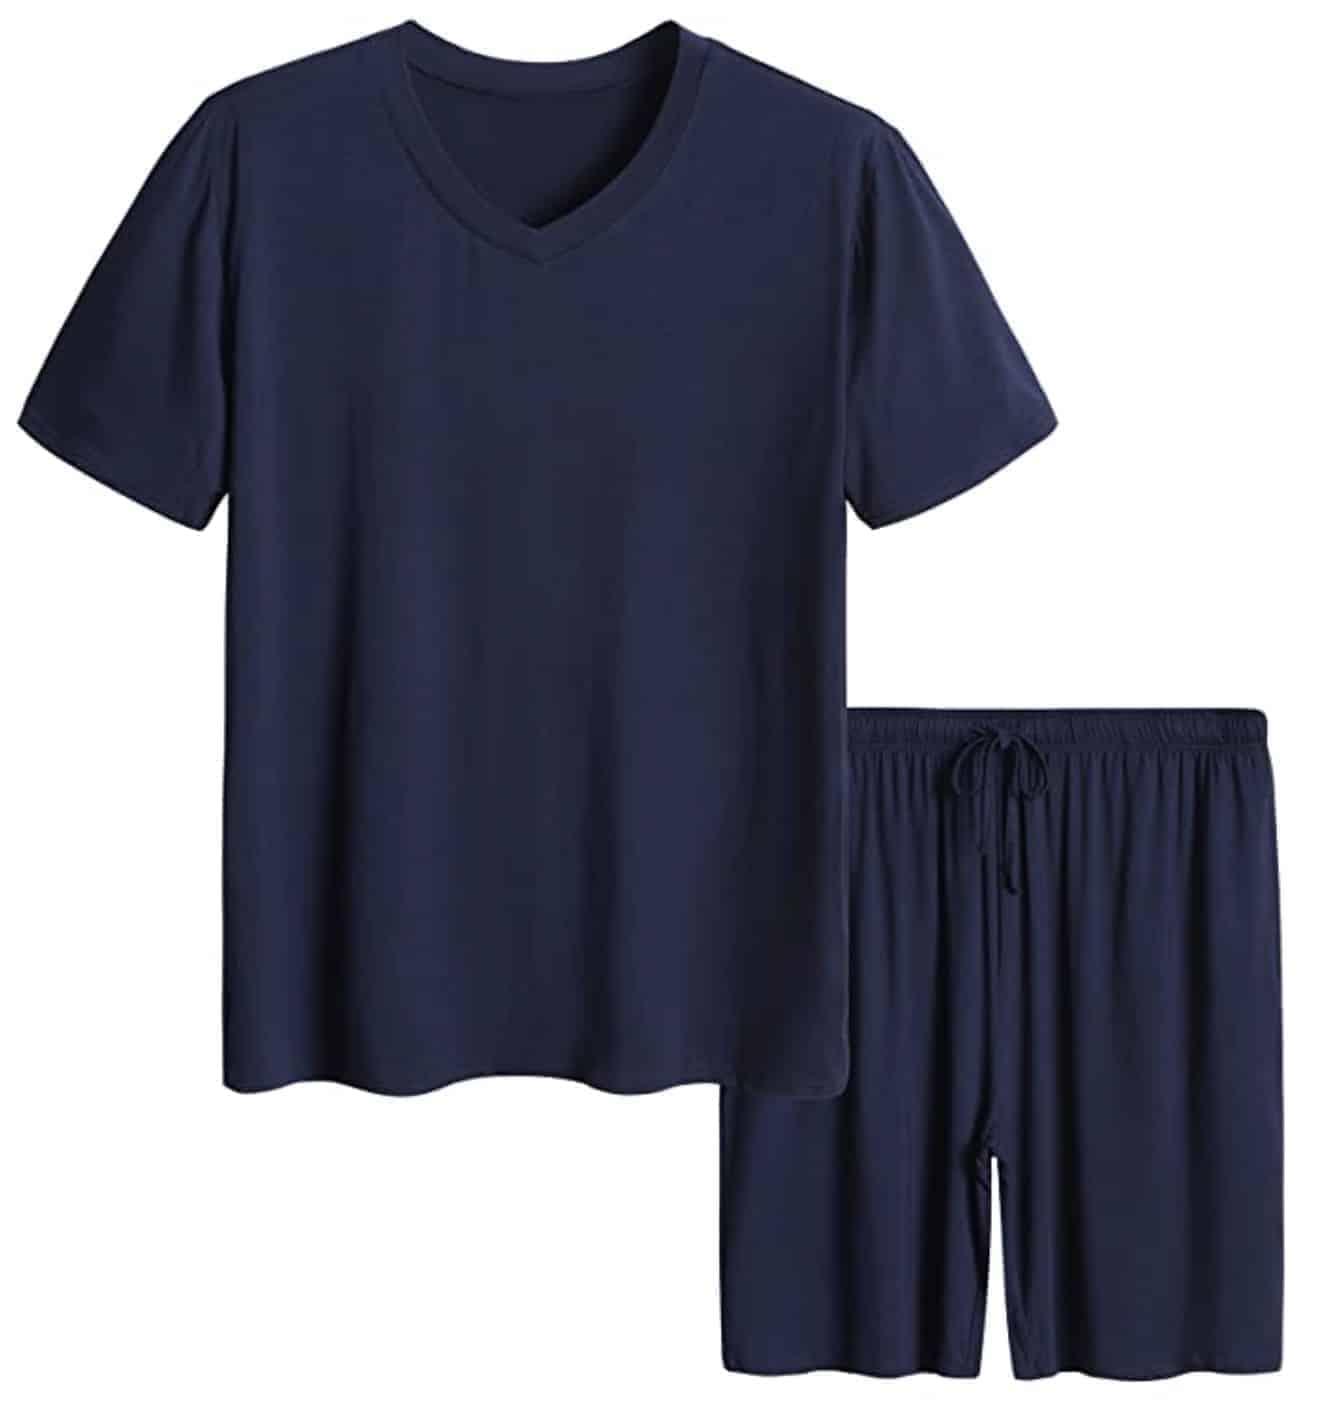 mens-pajama-set-gift-ideas-christmas-2020